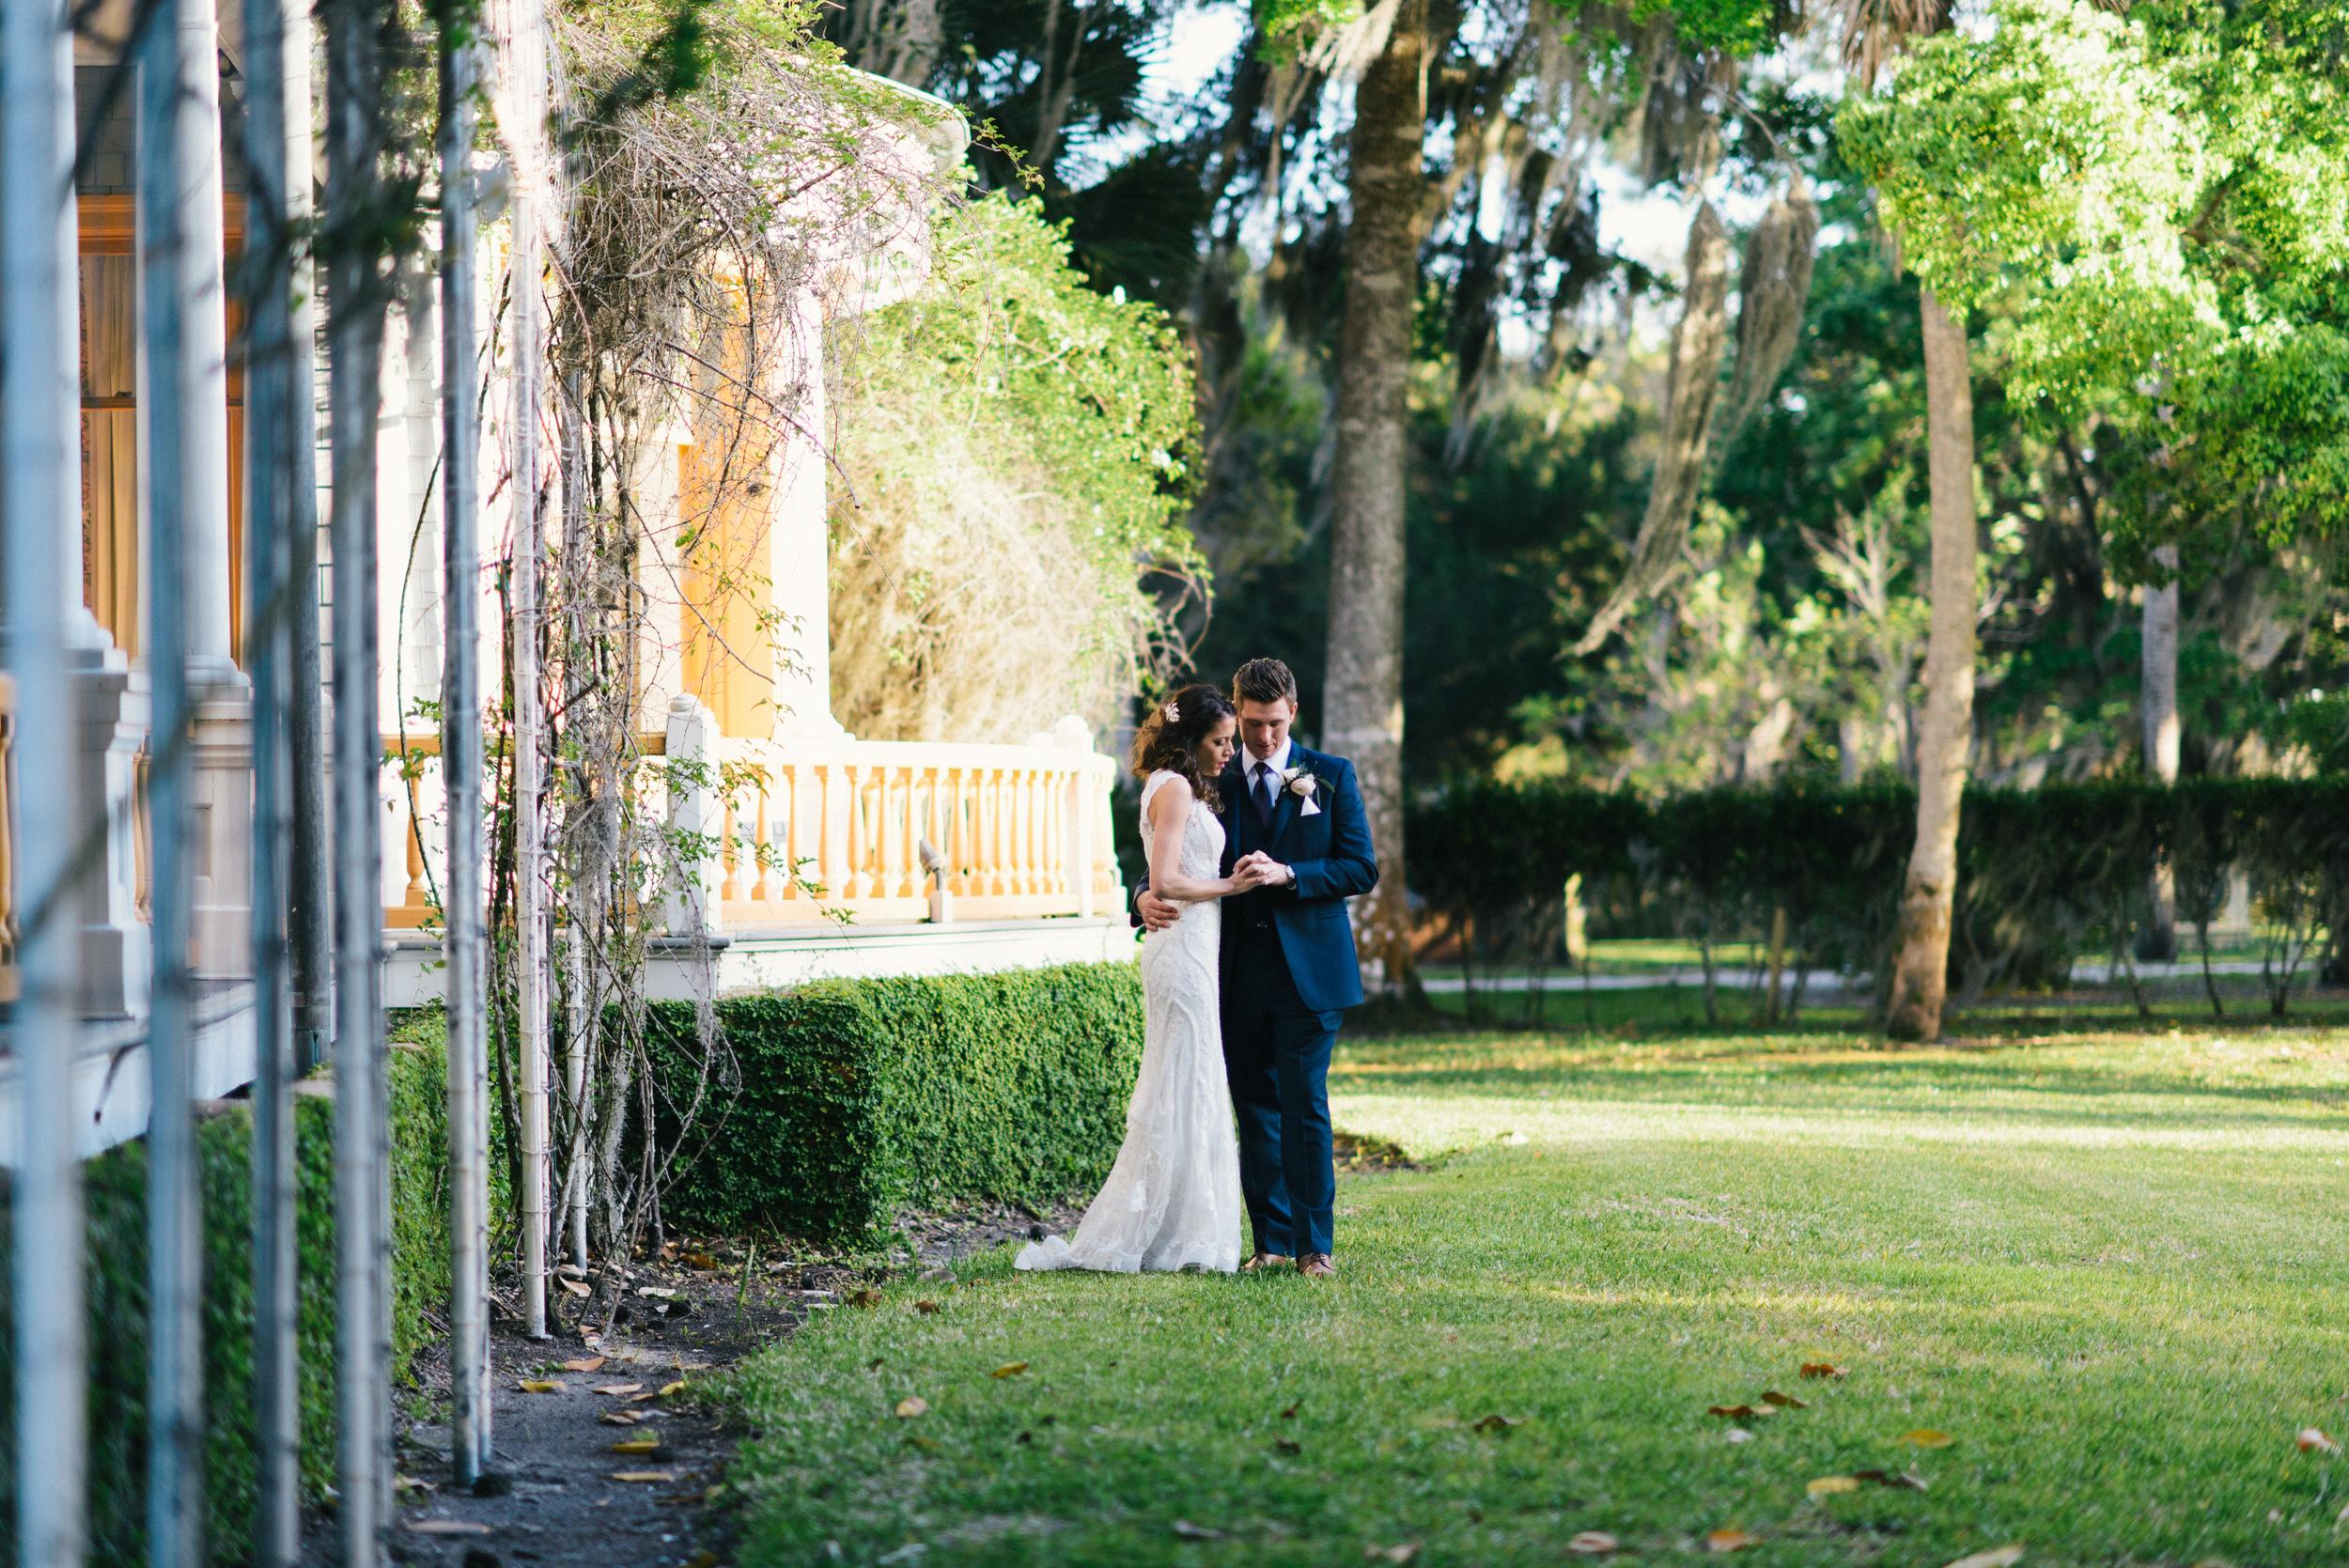 kadi-and-matt-carroll-april-9-2016-jekyl-island-wedding-m-newsom-photography- (542 of 744).jpg